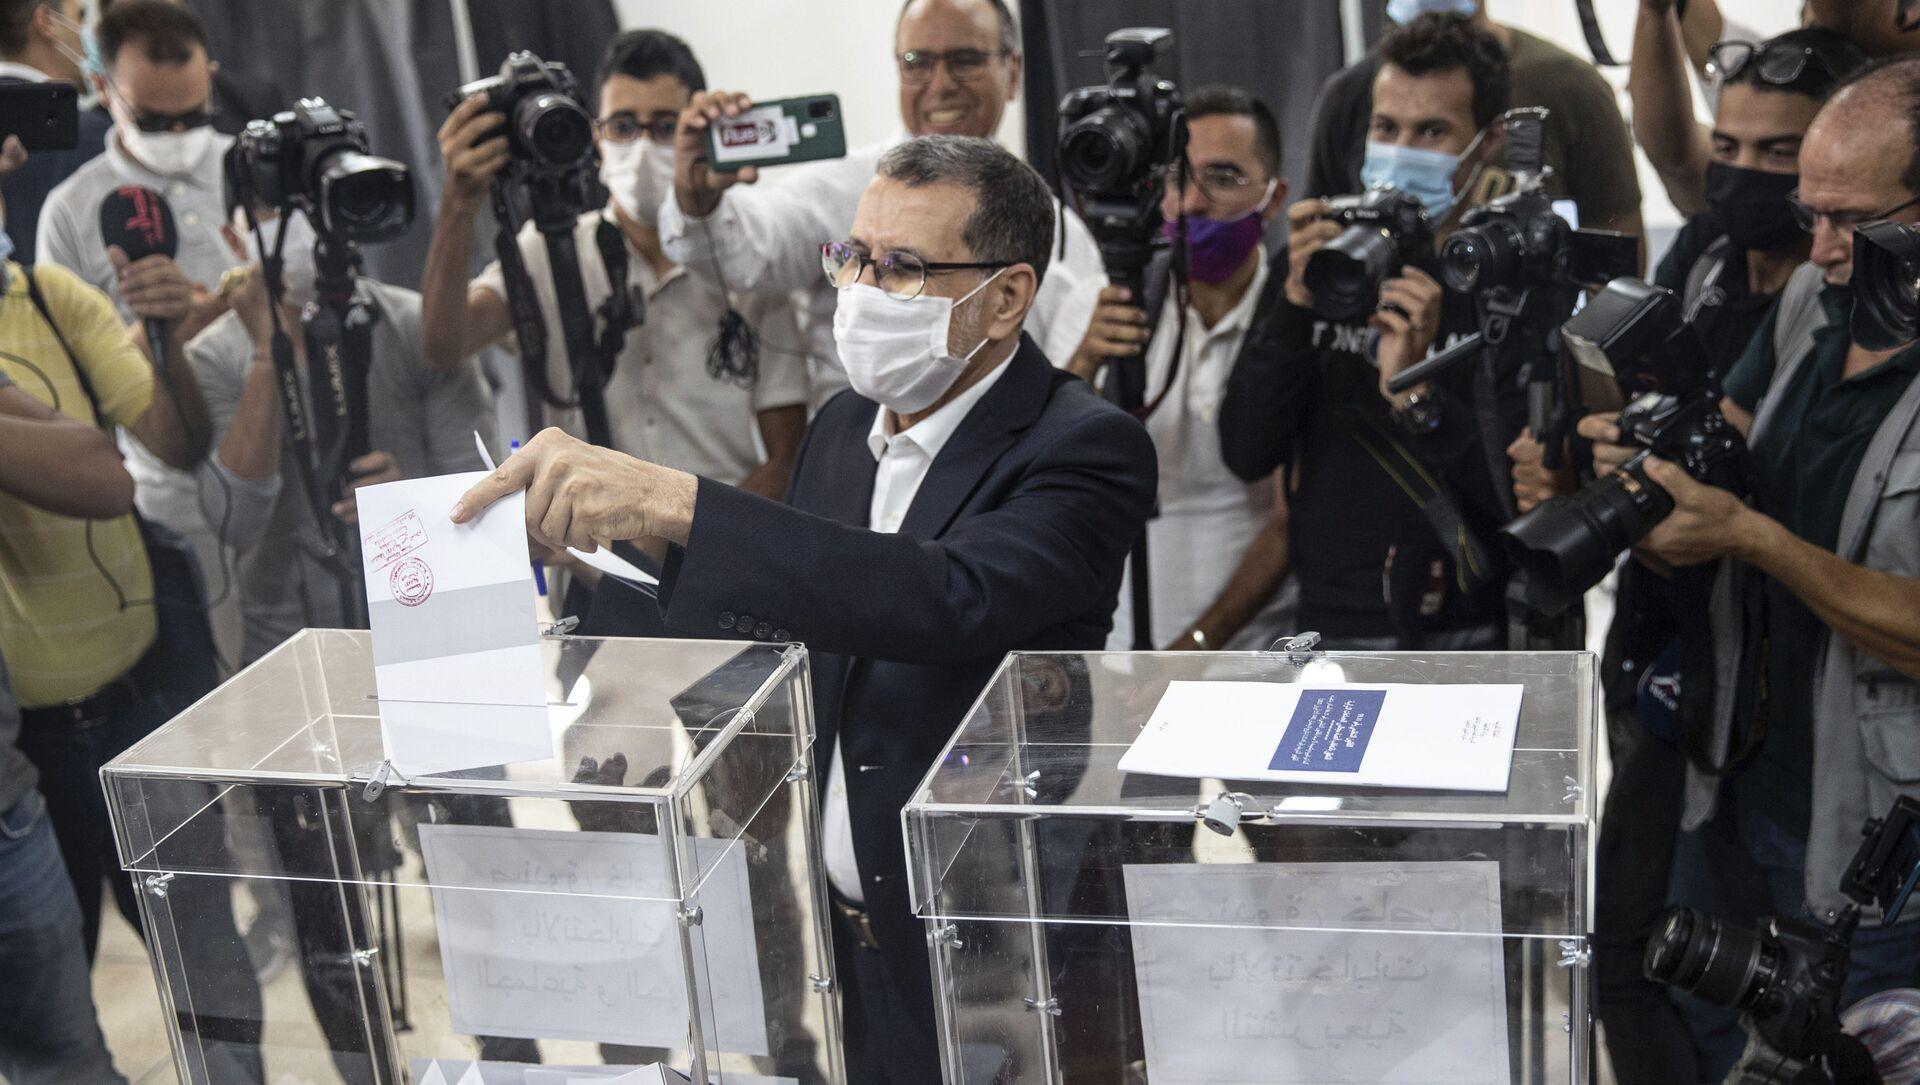 Saadeddine Othmani, leader du PJD et Premier ministre sortant, vote dans sa commune de Salé, le 8 septembre 2021 - Sputnik France, 1920, 10.09.2021